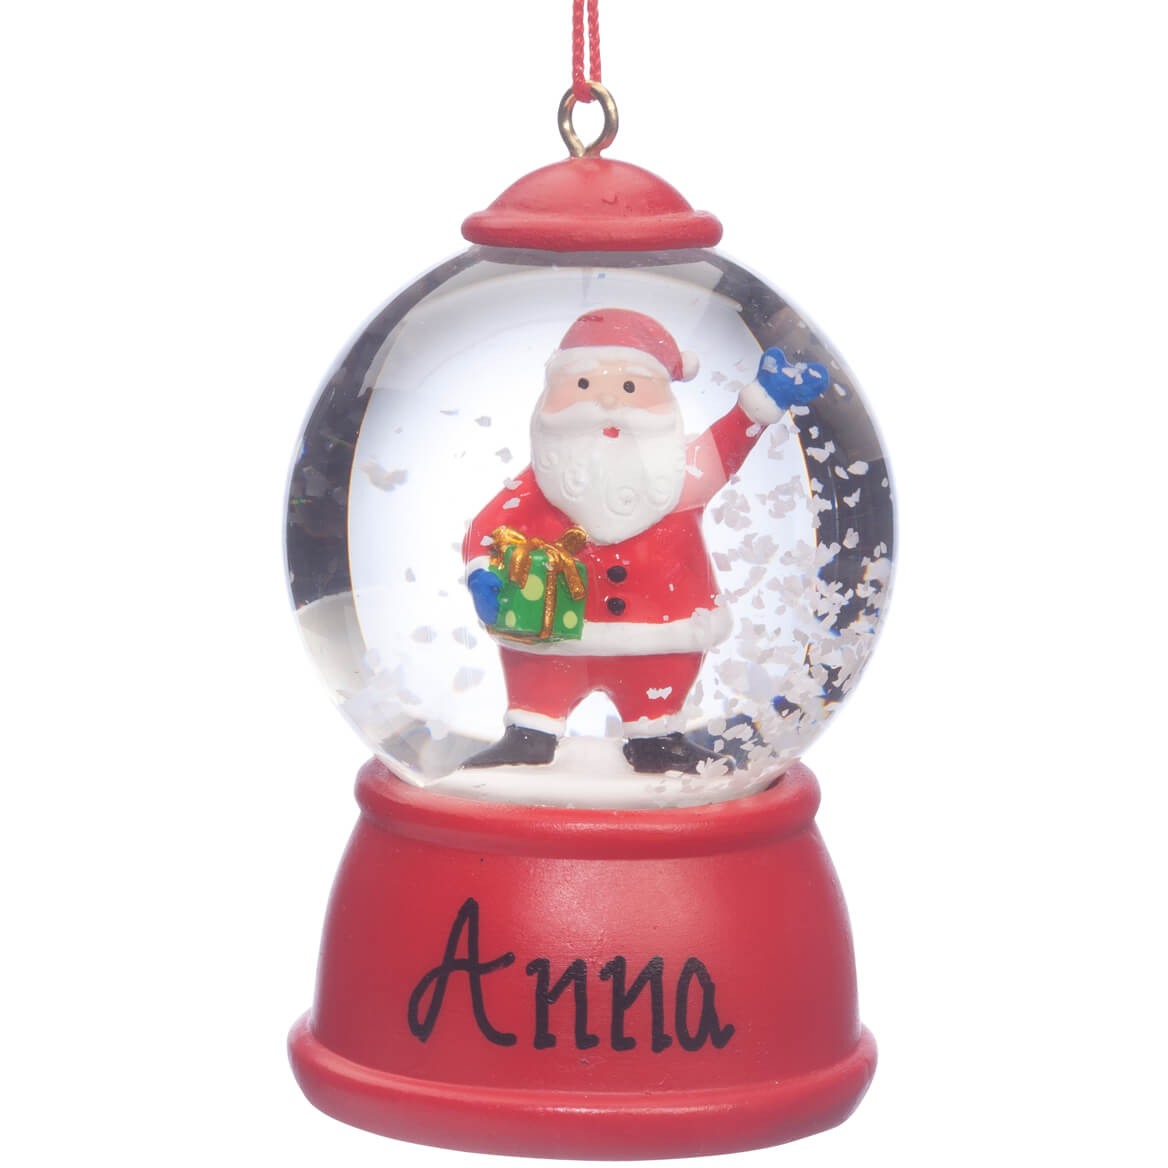 Personalized Santa Waterglobe Ornament-360318